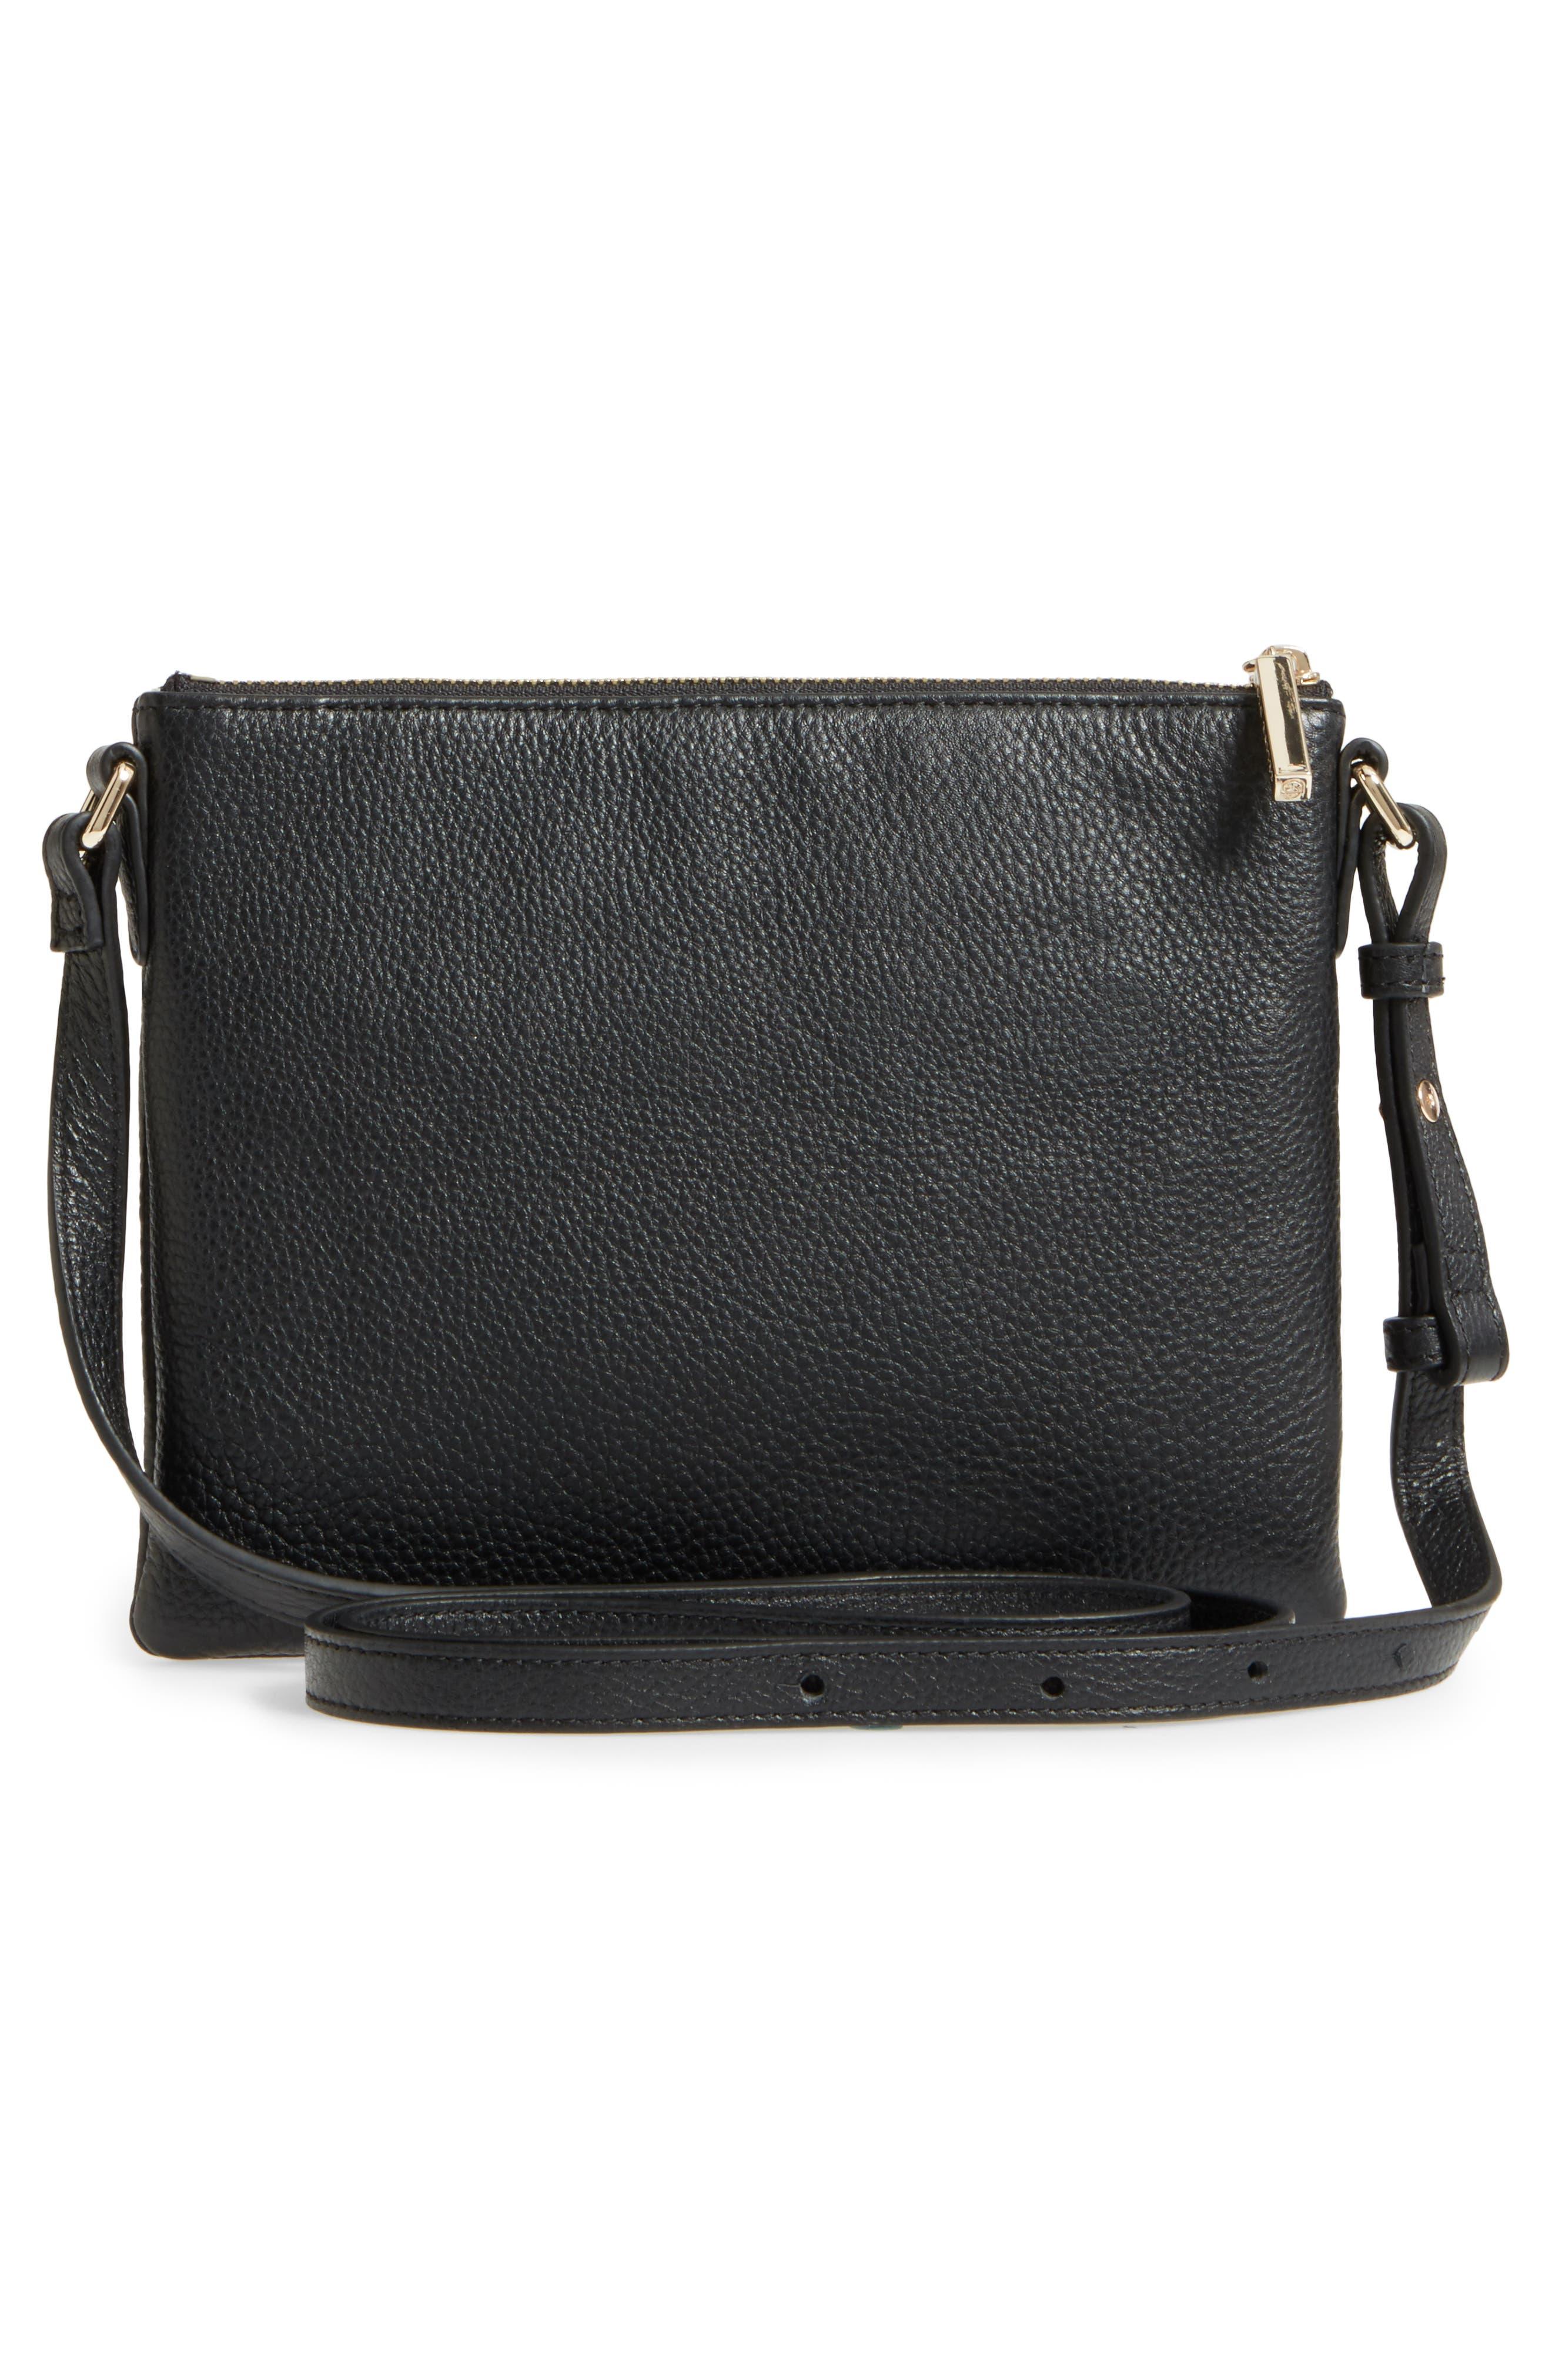 Céline Dion Adagio Leather Crossbody Bag,                             Alternate thumbnail 3, color,                             001